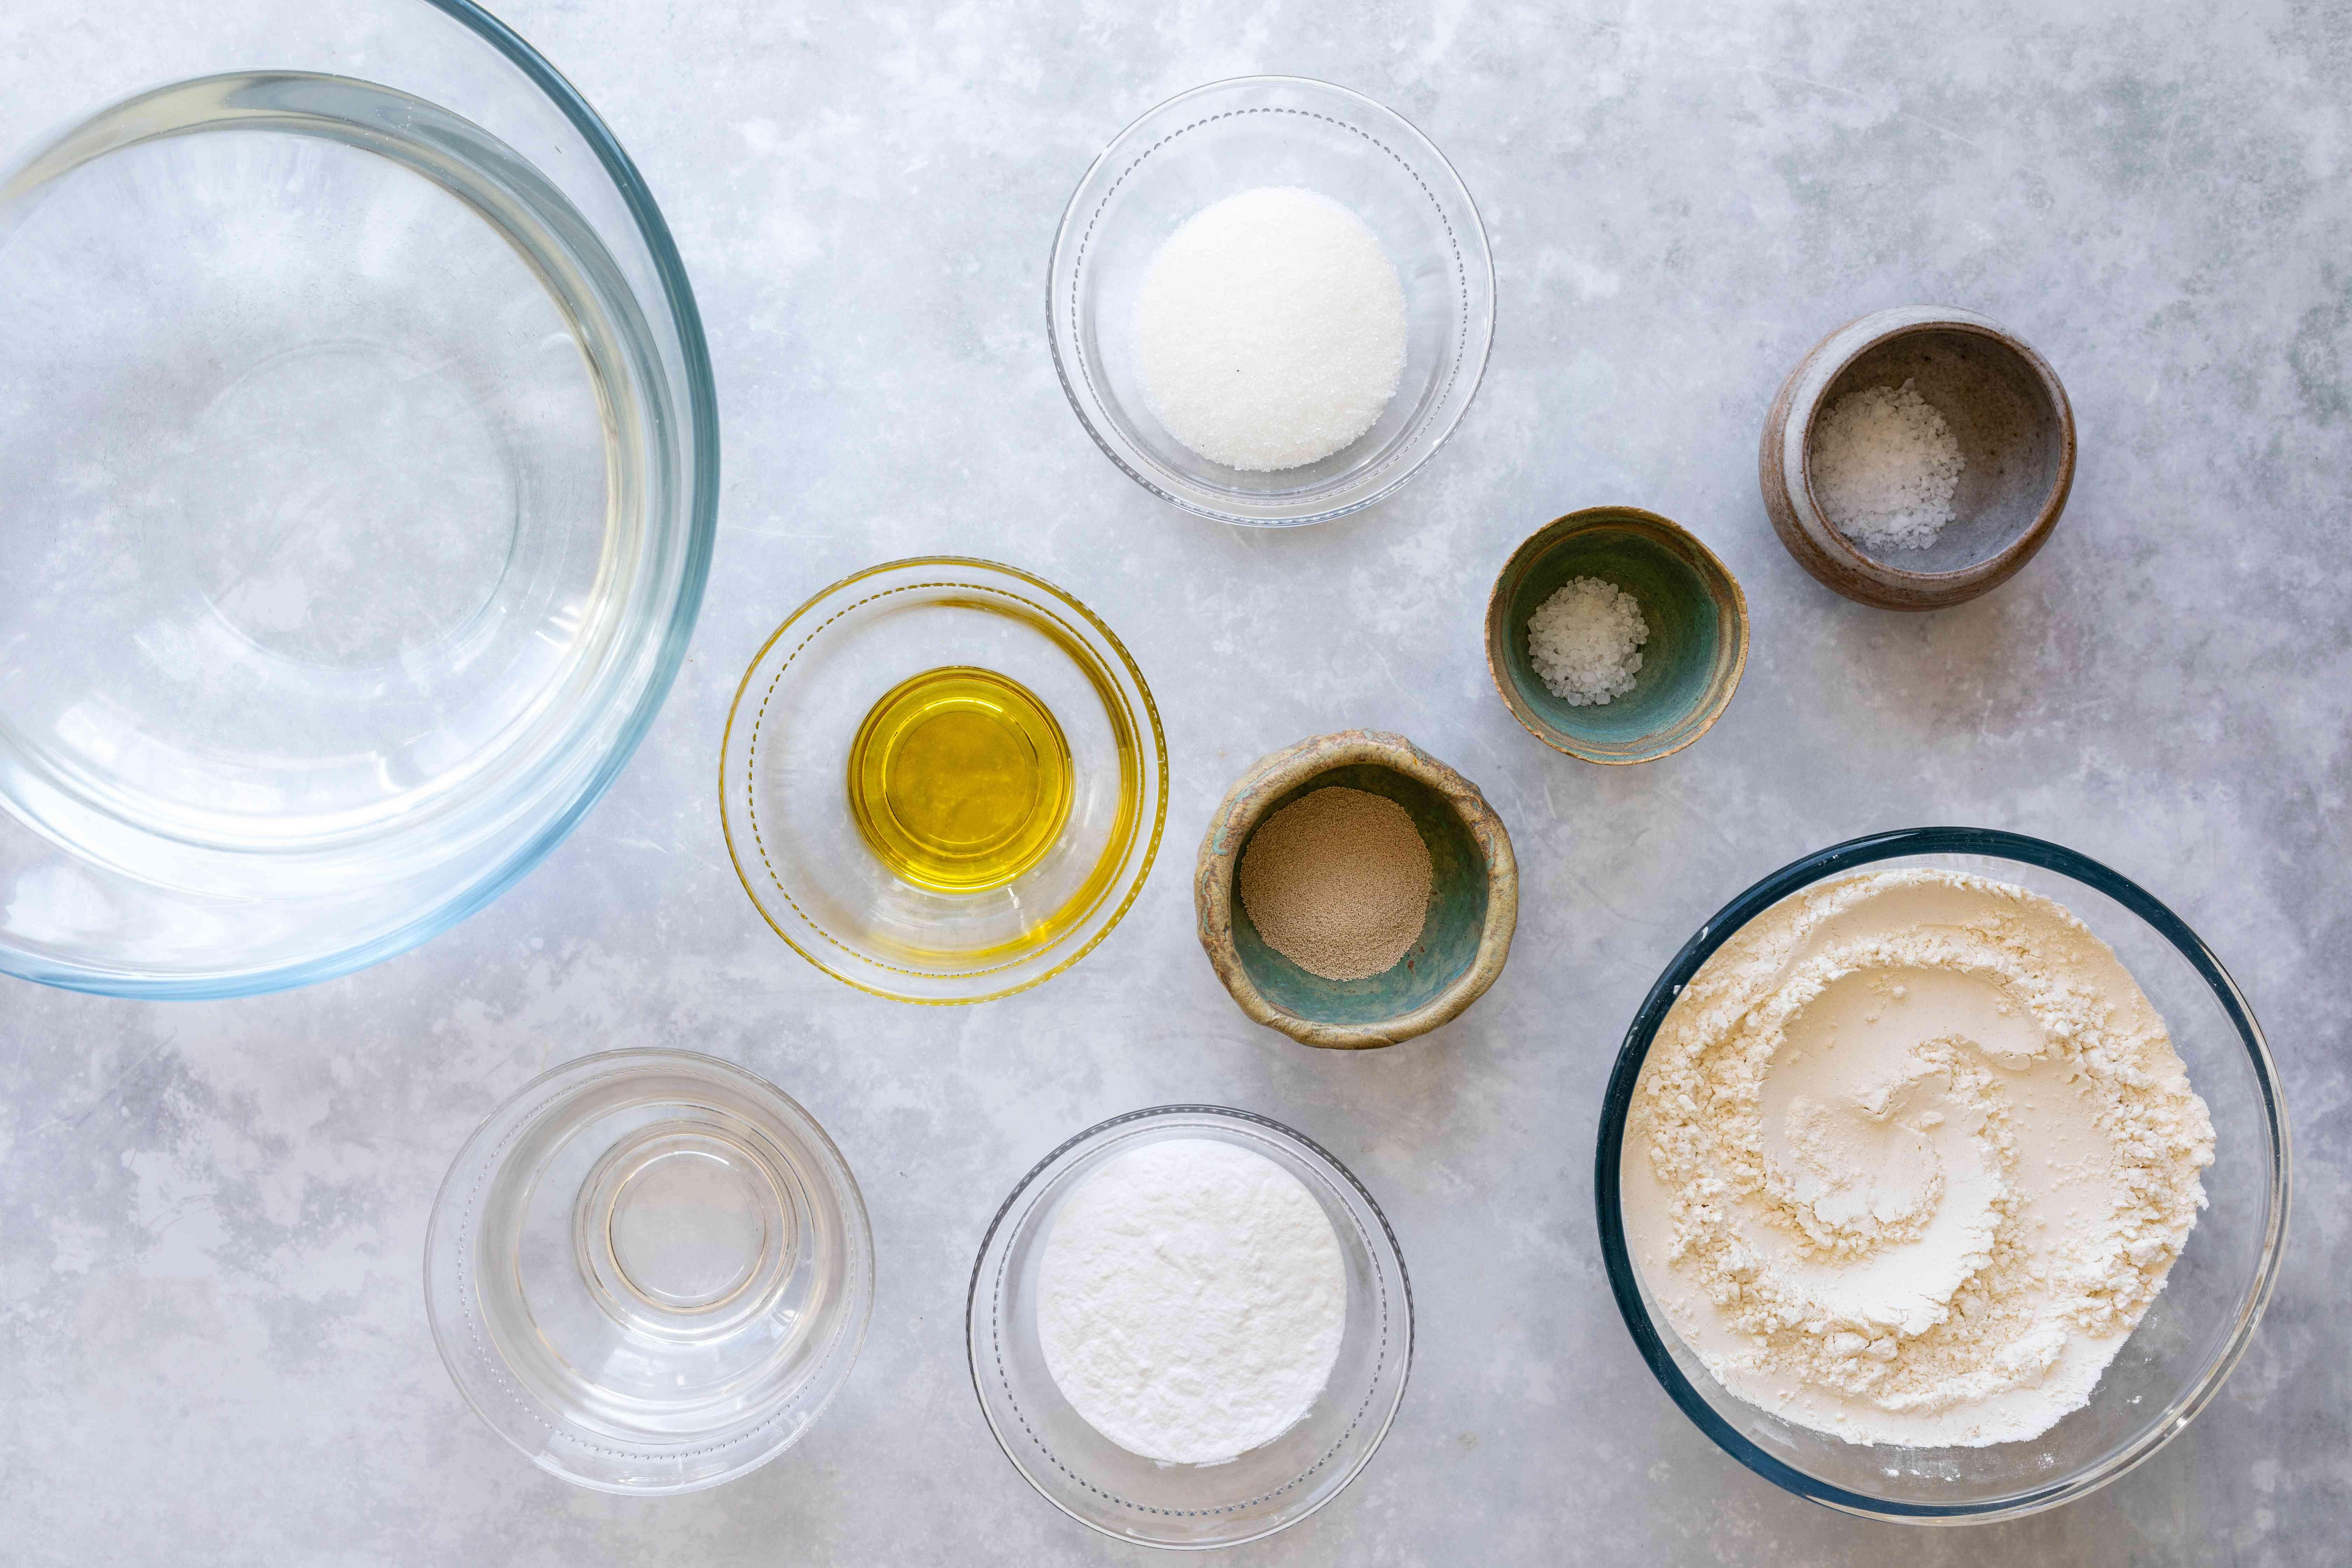 Ingredients for dairy-free soft pretzels